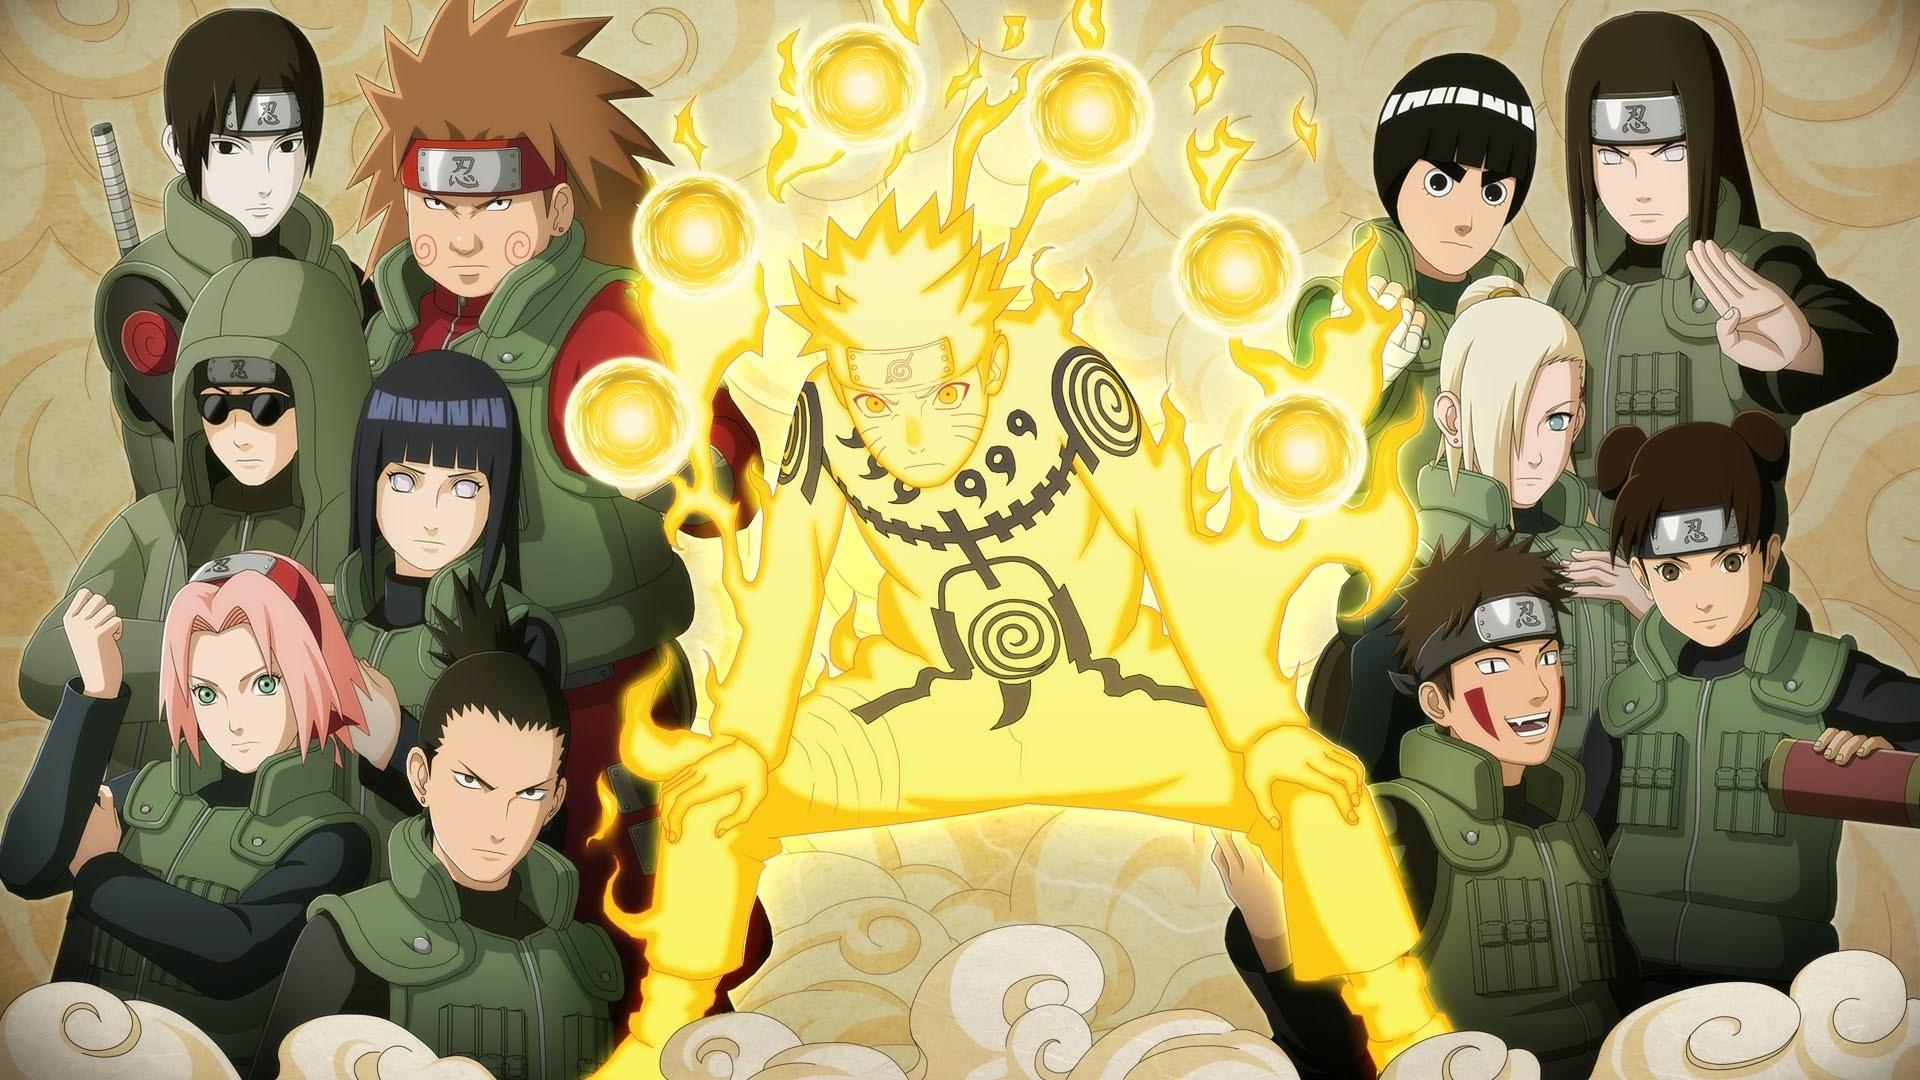 Naruto desktop wallpaper free download